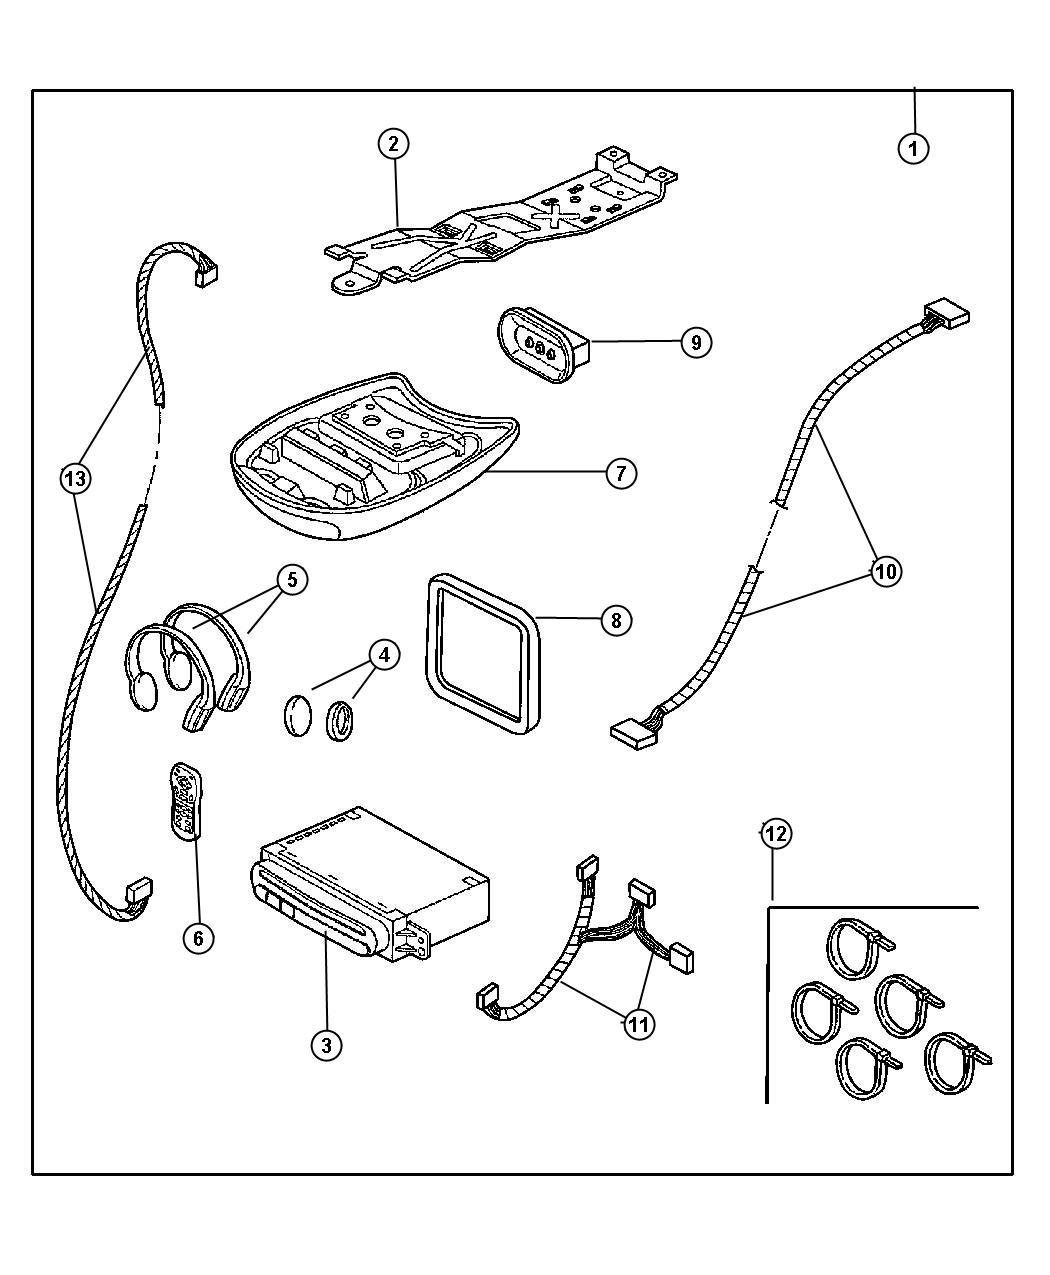 2007 chrysler aspen fuse diagram heating wiring multiple zones oem parts imageresizertool com